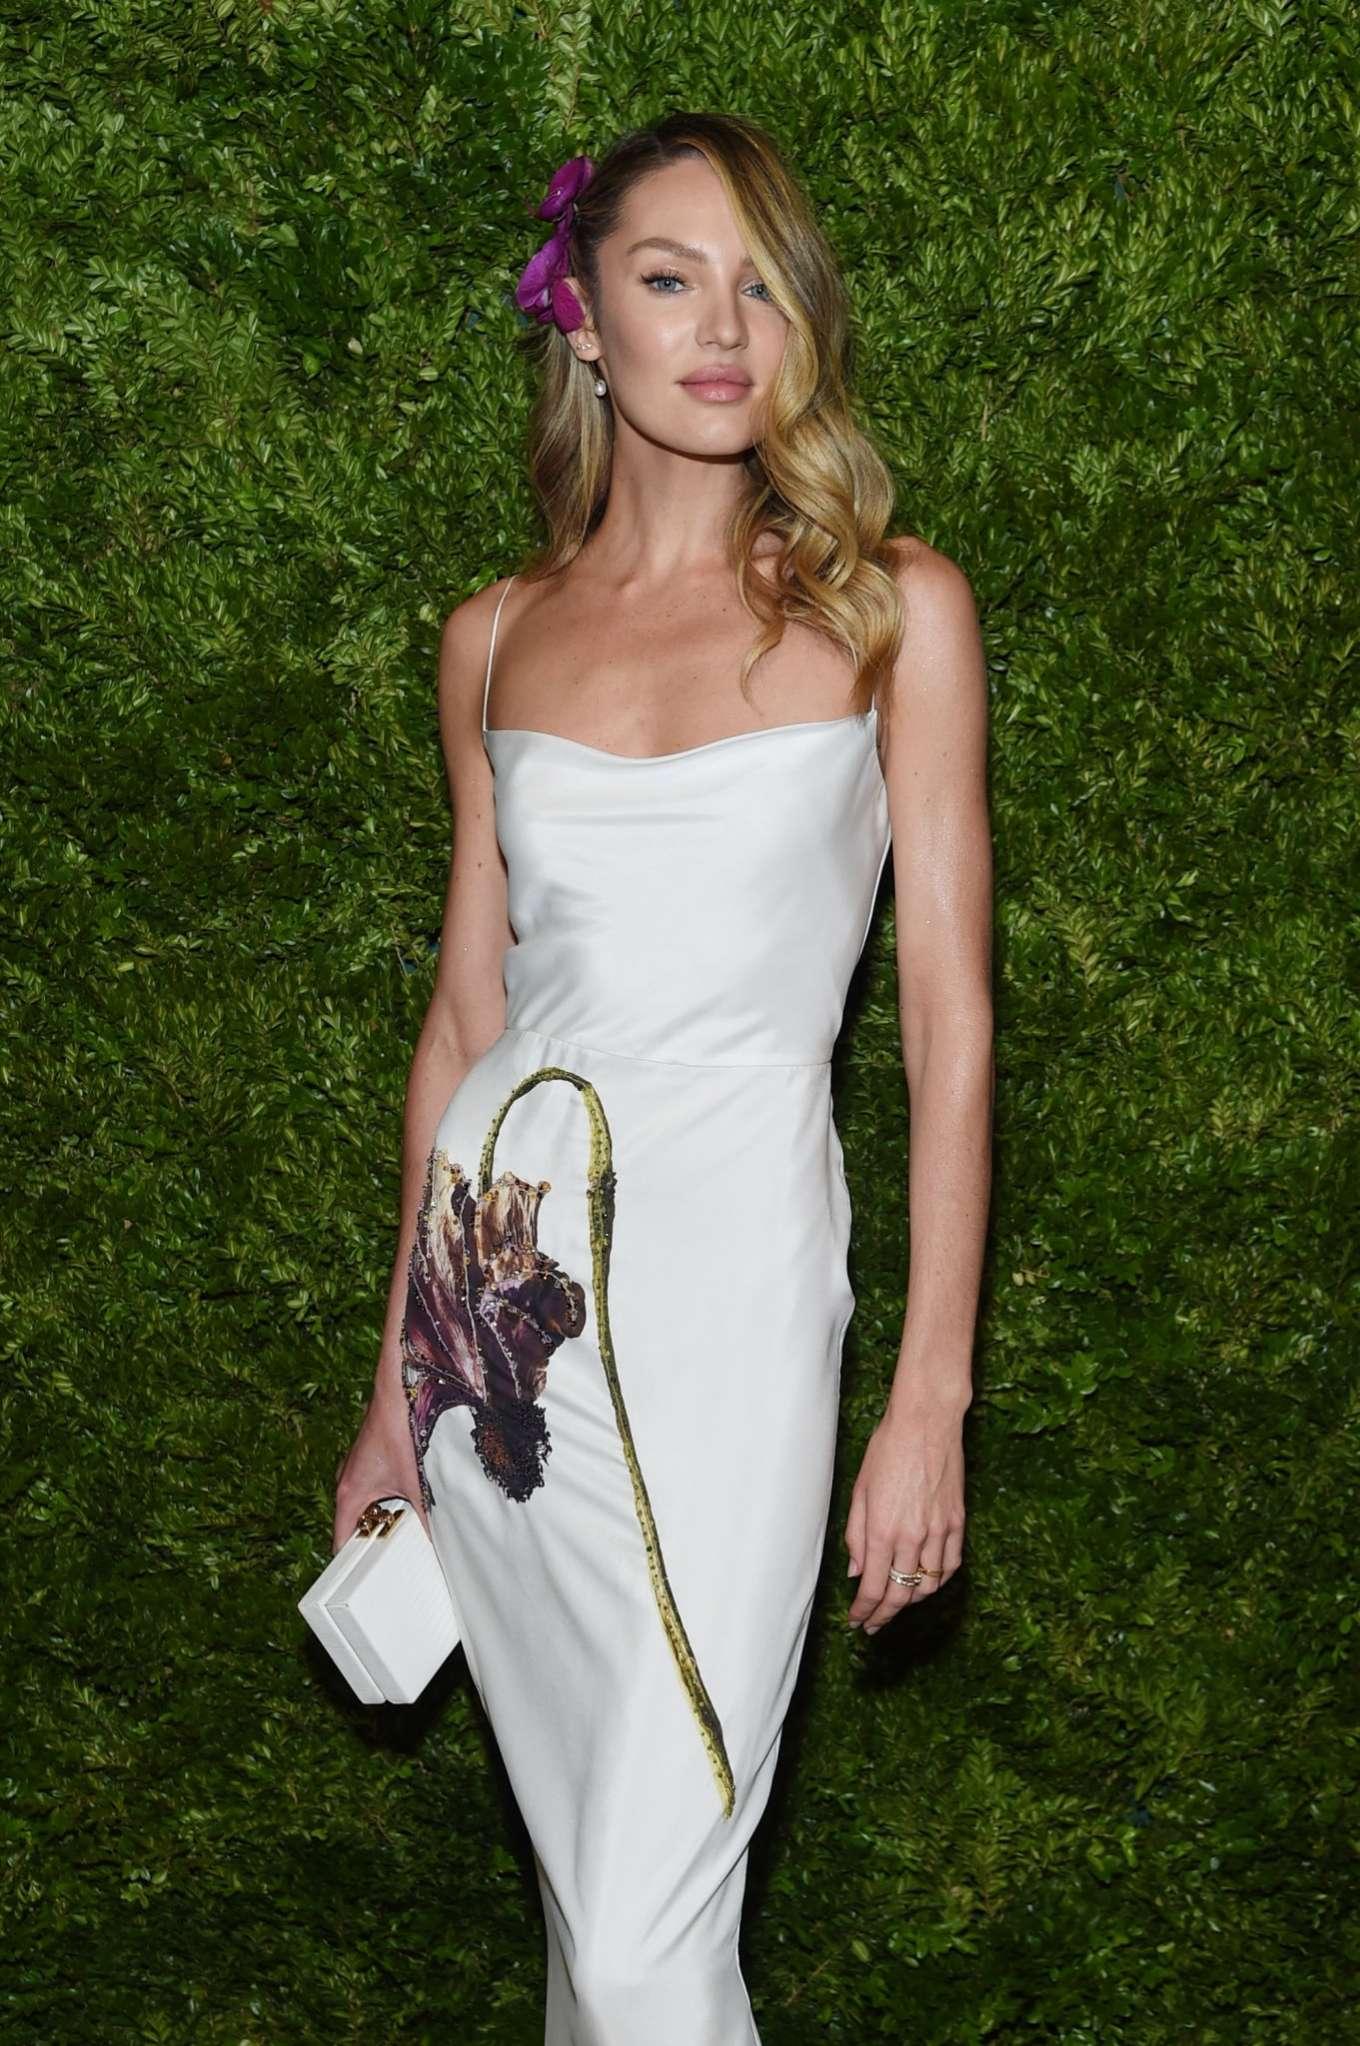 Candice Swanepoel - CFDA/Vogue Fashion Fund 2019 Awards in NYC